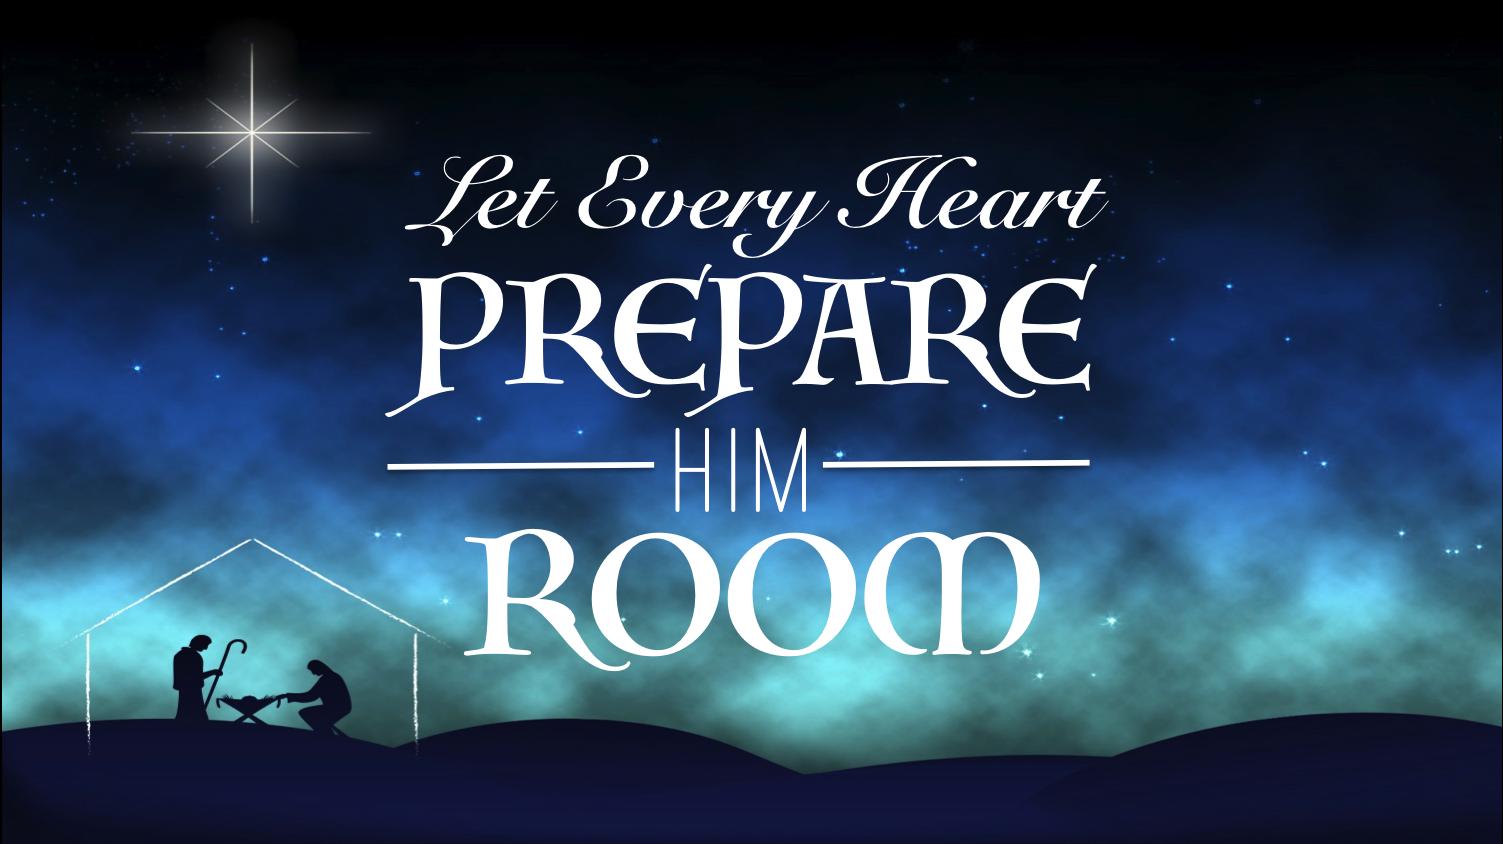 Prepare-Him-Room-ART.png